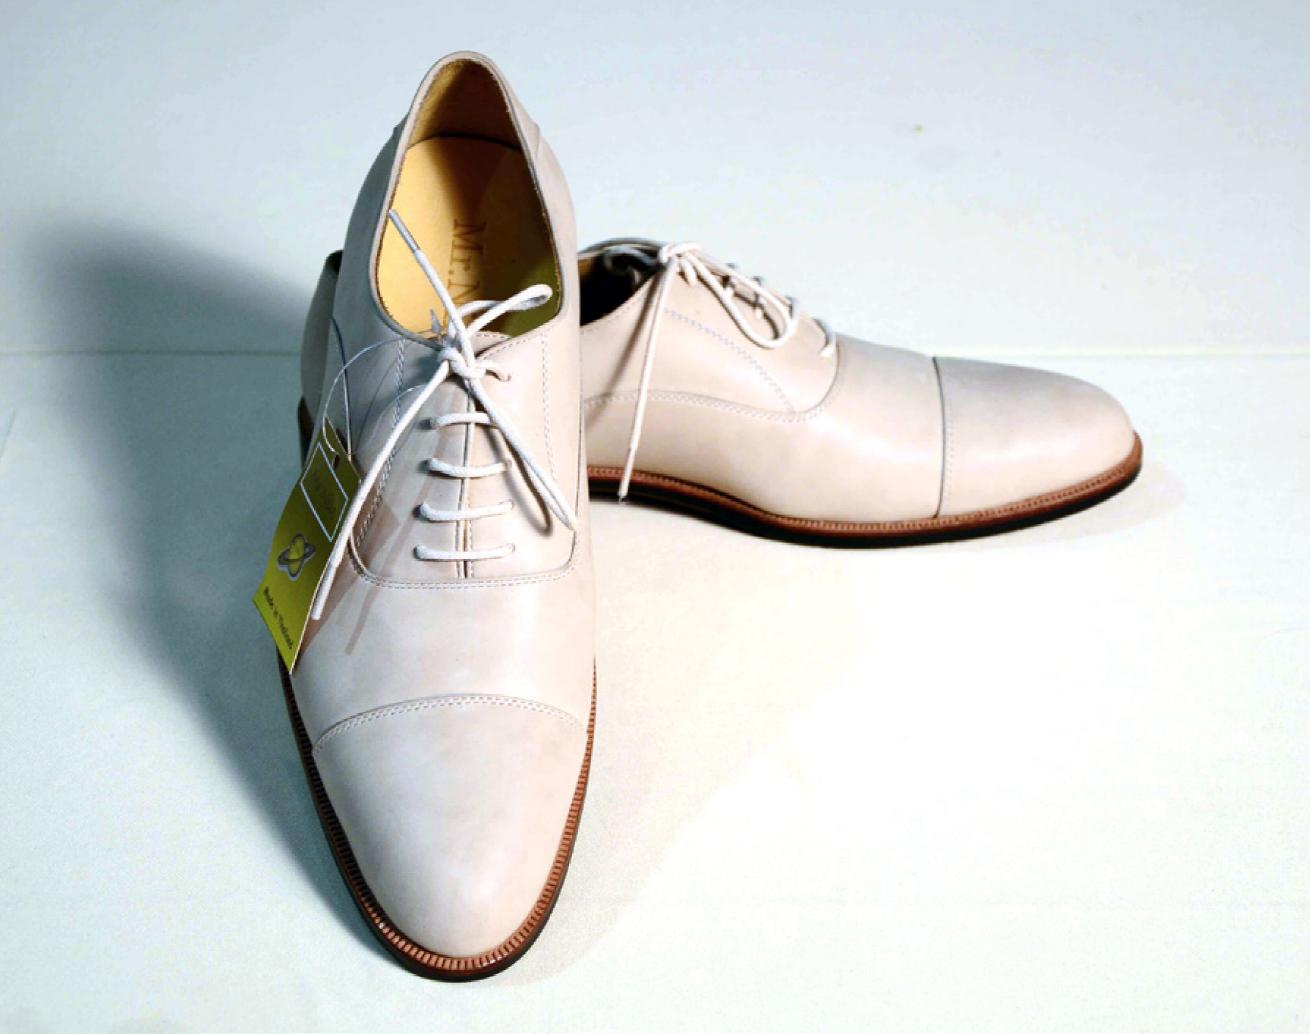 C03014 รองเท้าหนัง (MR.Nile)